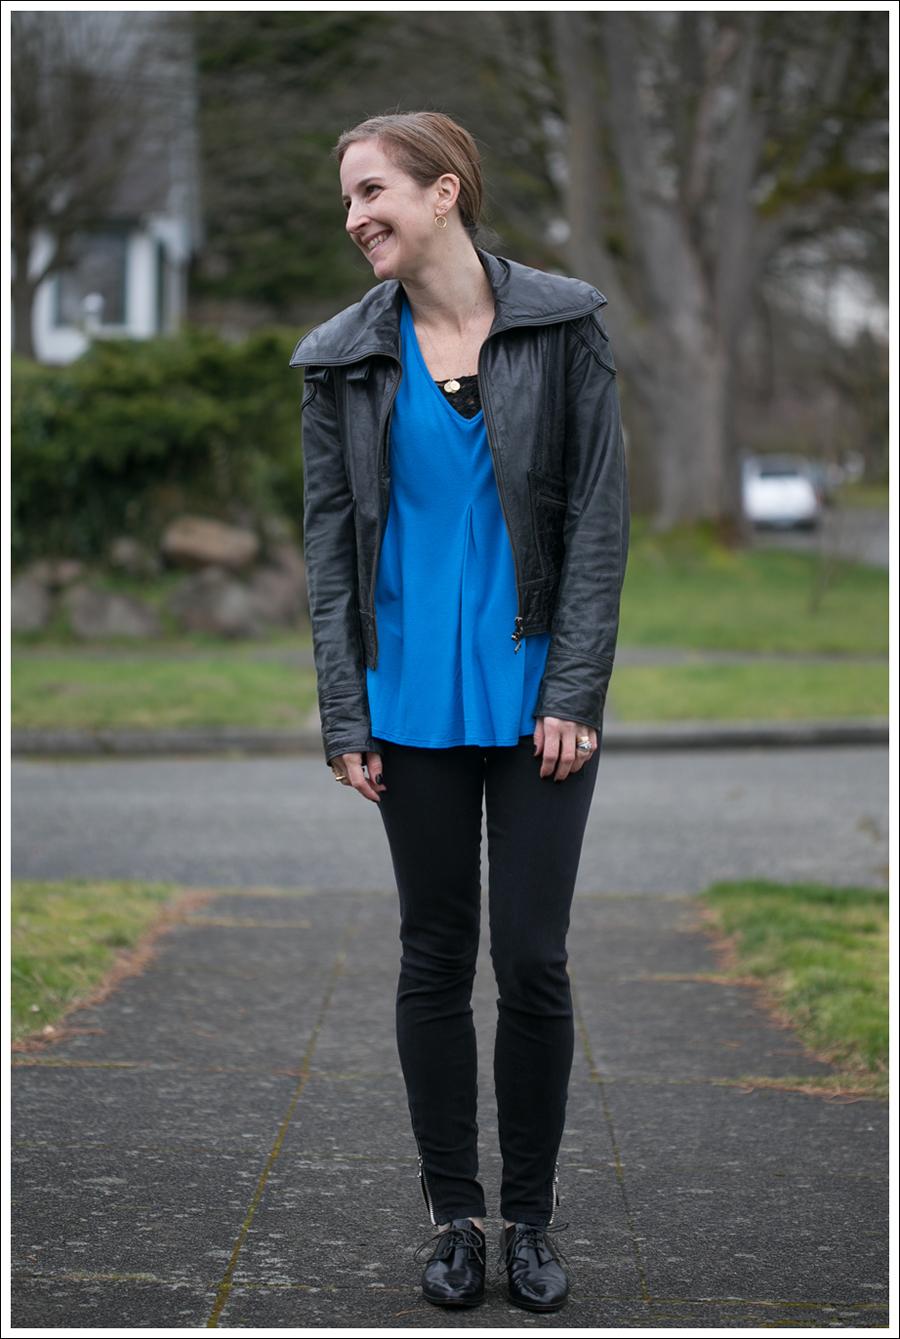 Blog Doma Leather Jacket Zara Joes Jeans Zipper Pura Lopez Oxfords-1